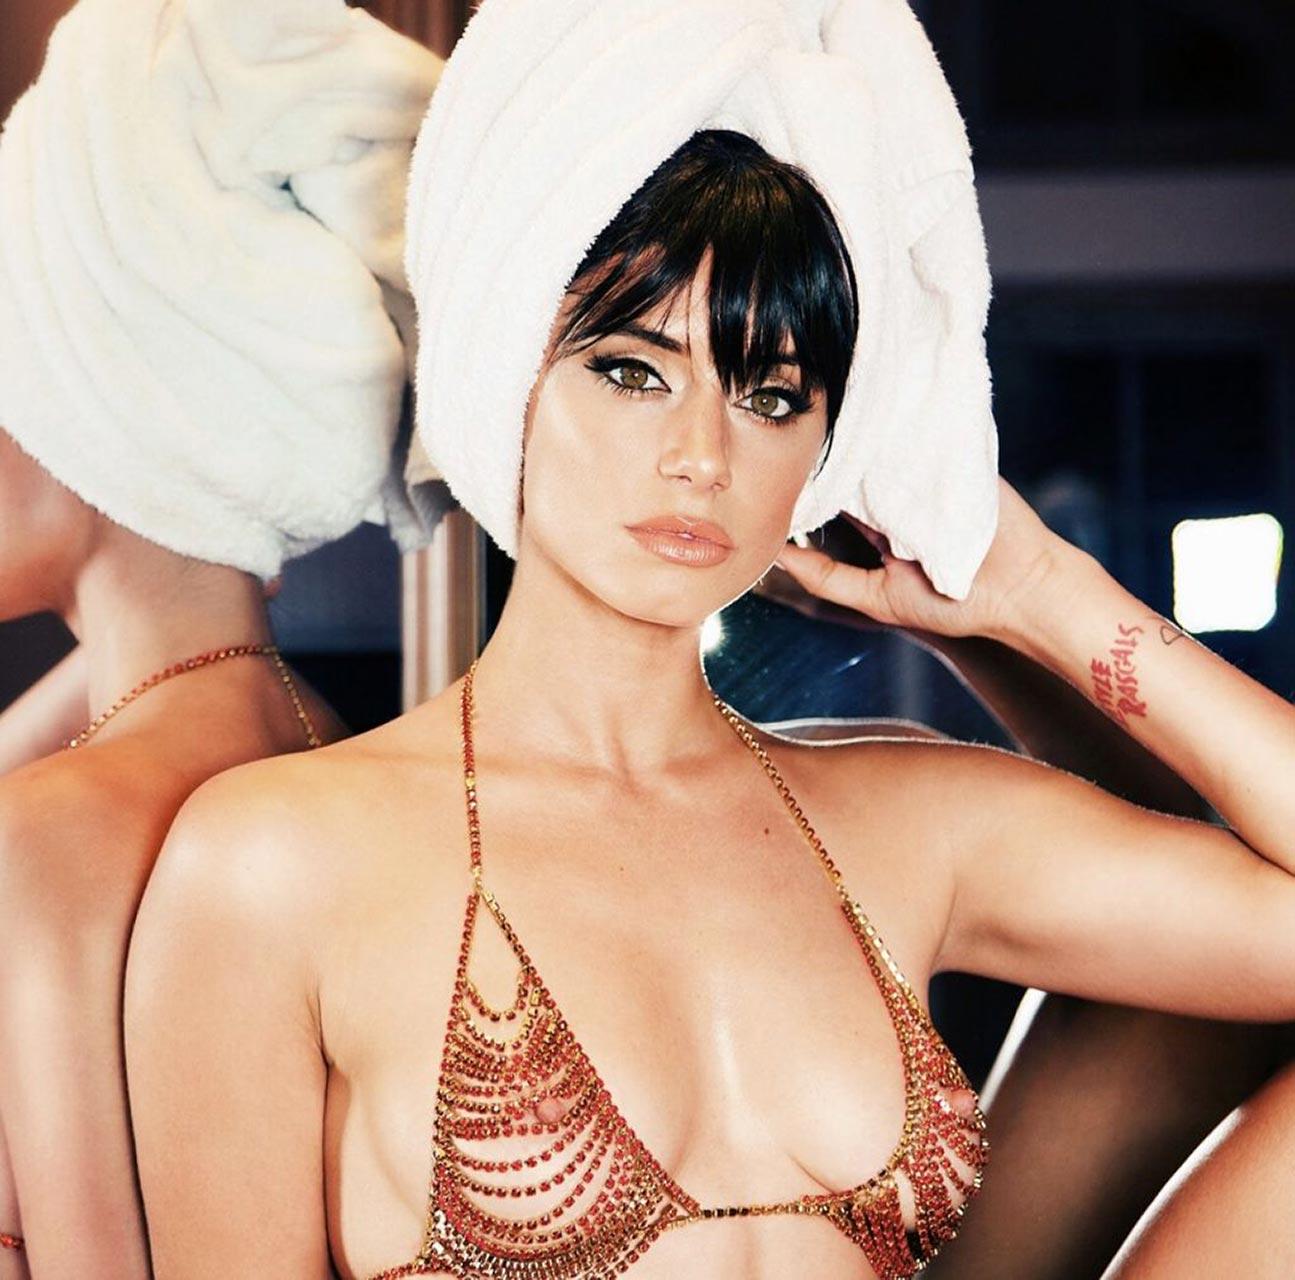 ICloud Nicole Thorne nude (45 foto and video), Sexy, Cleavage, Selfie, bra 2020